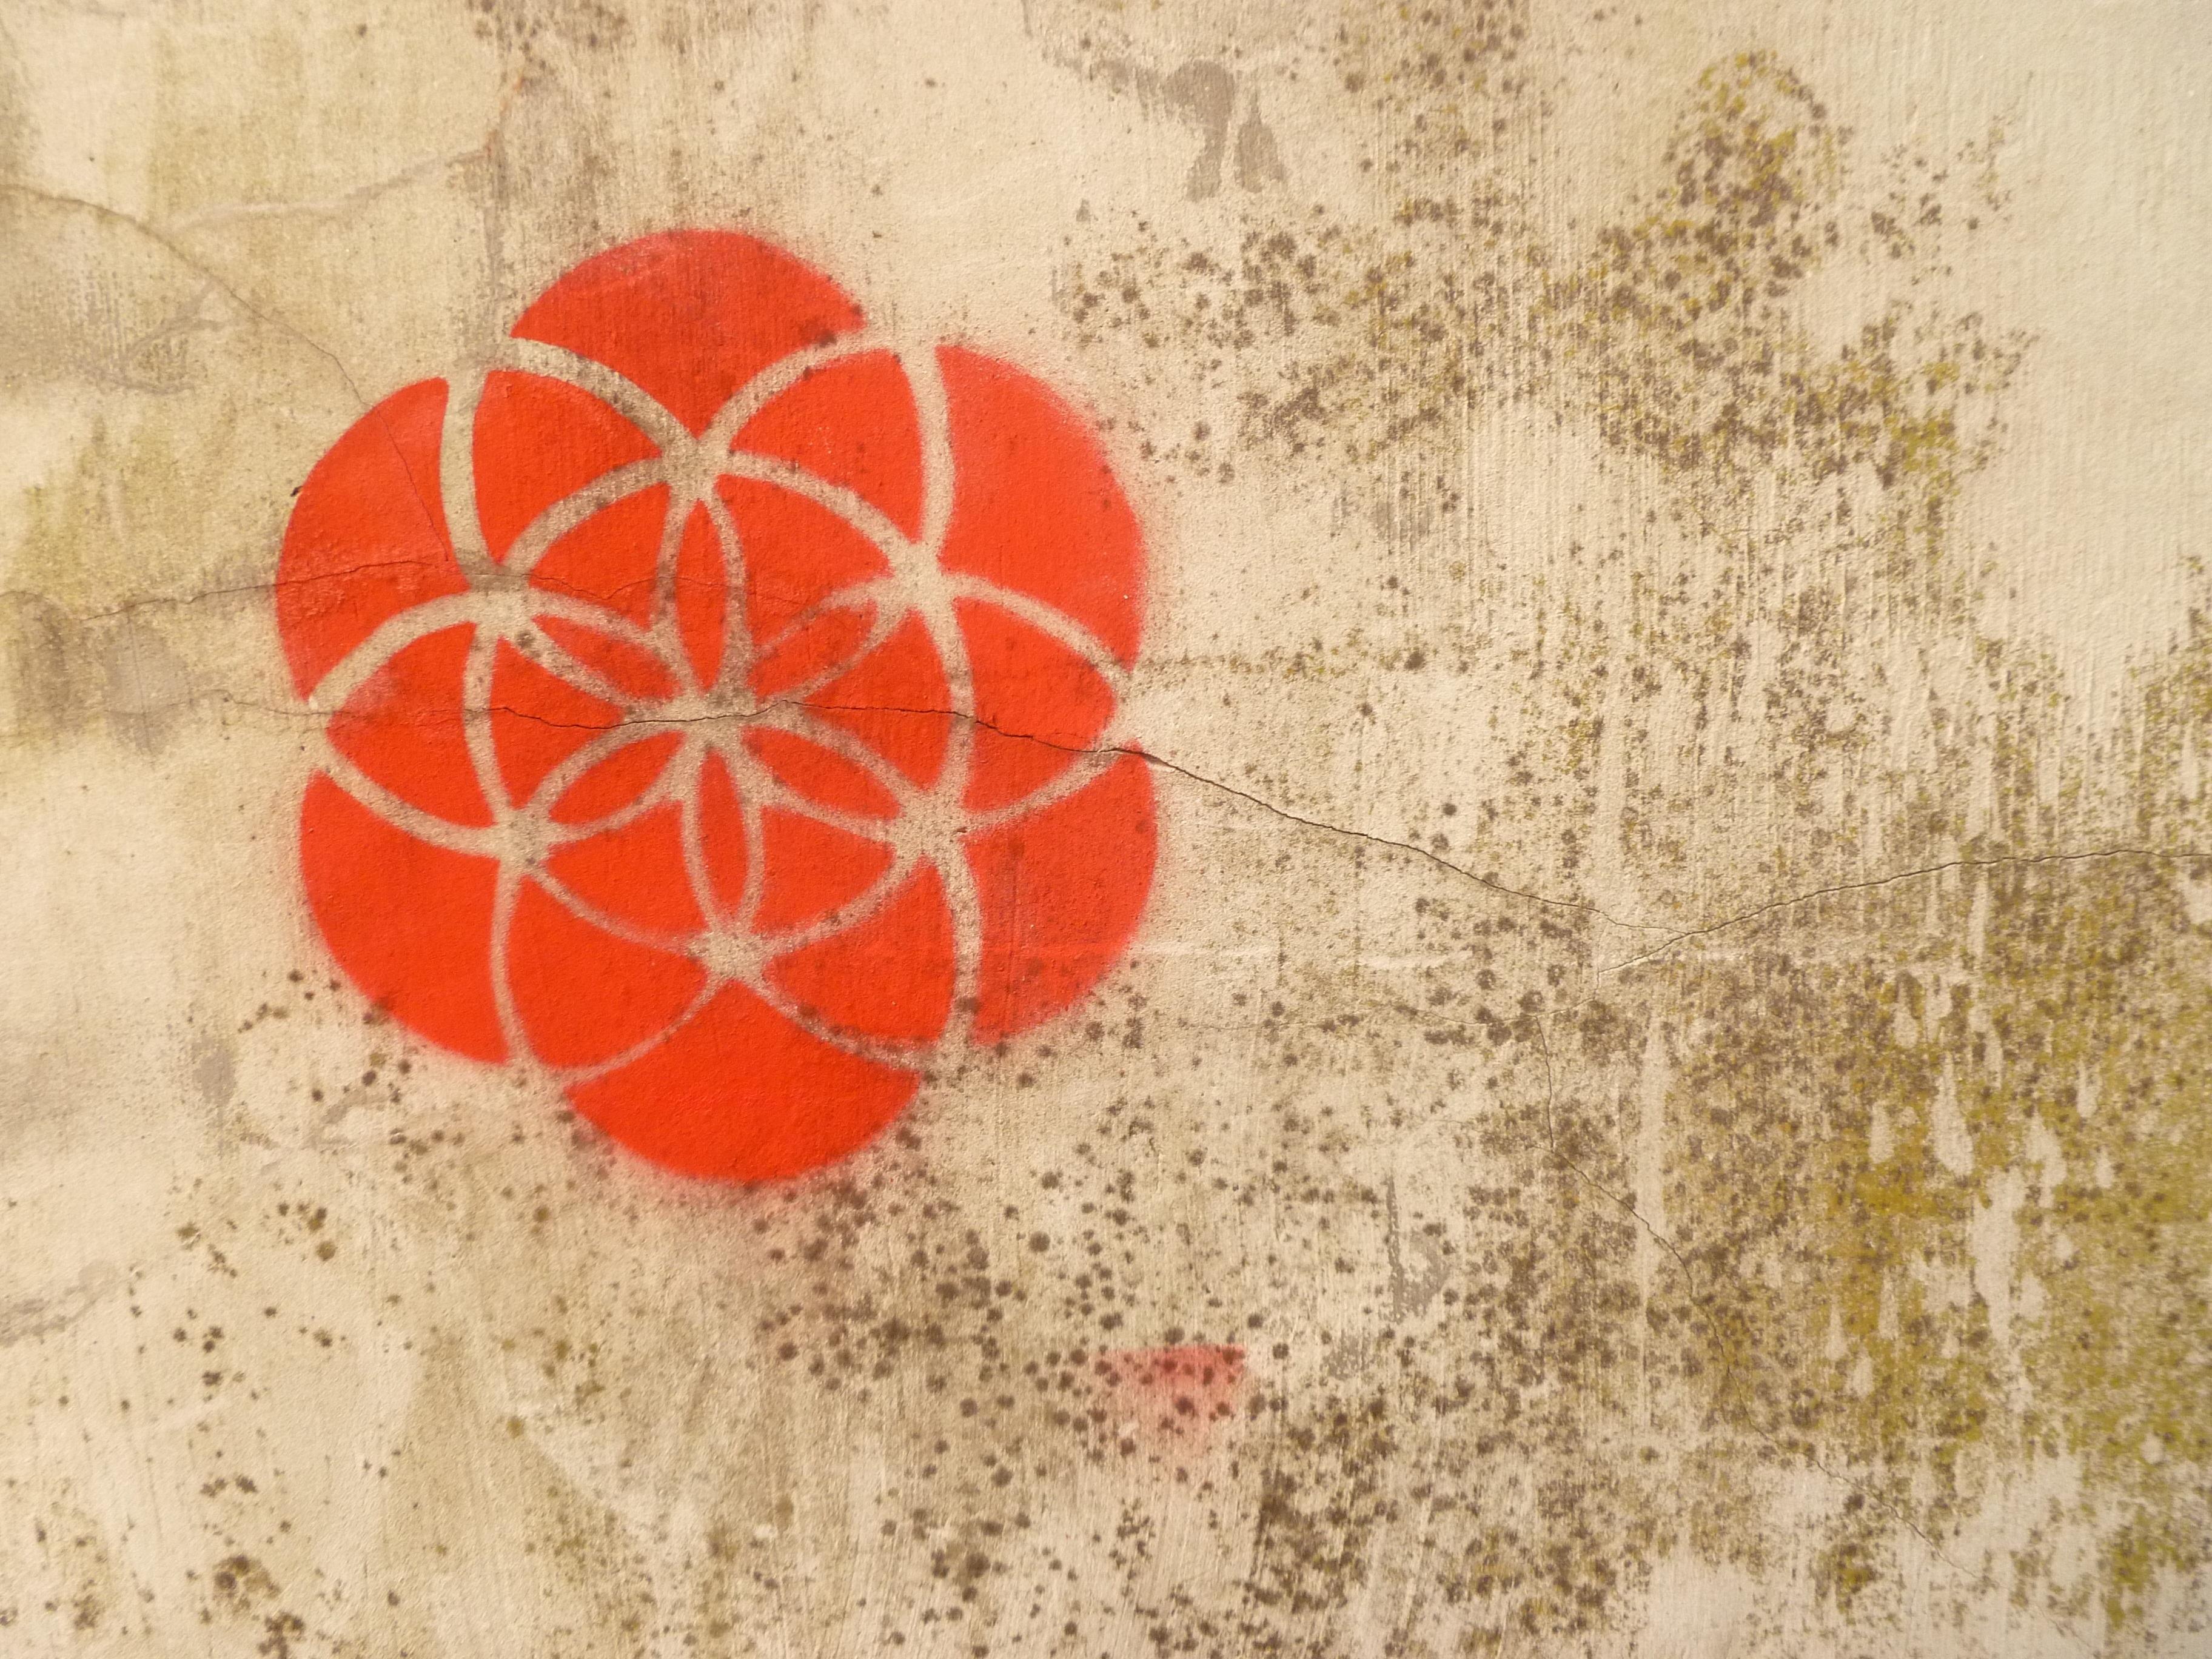 Graffiti wall amsterdam - Texture Flower Urban Wall Orange Pattern Red Graffiti Material Circle Street Art Textile Art Amsterdam Drawing